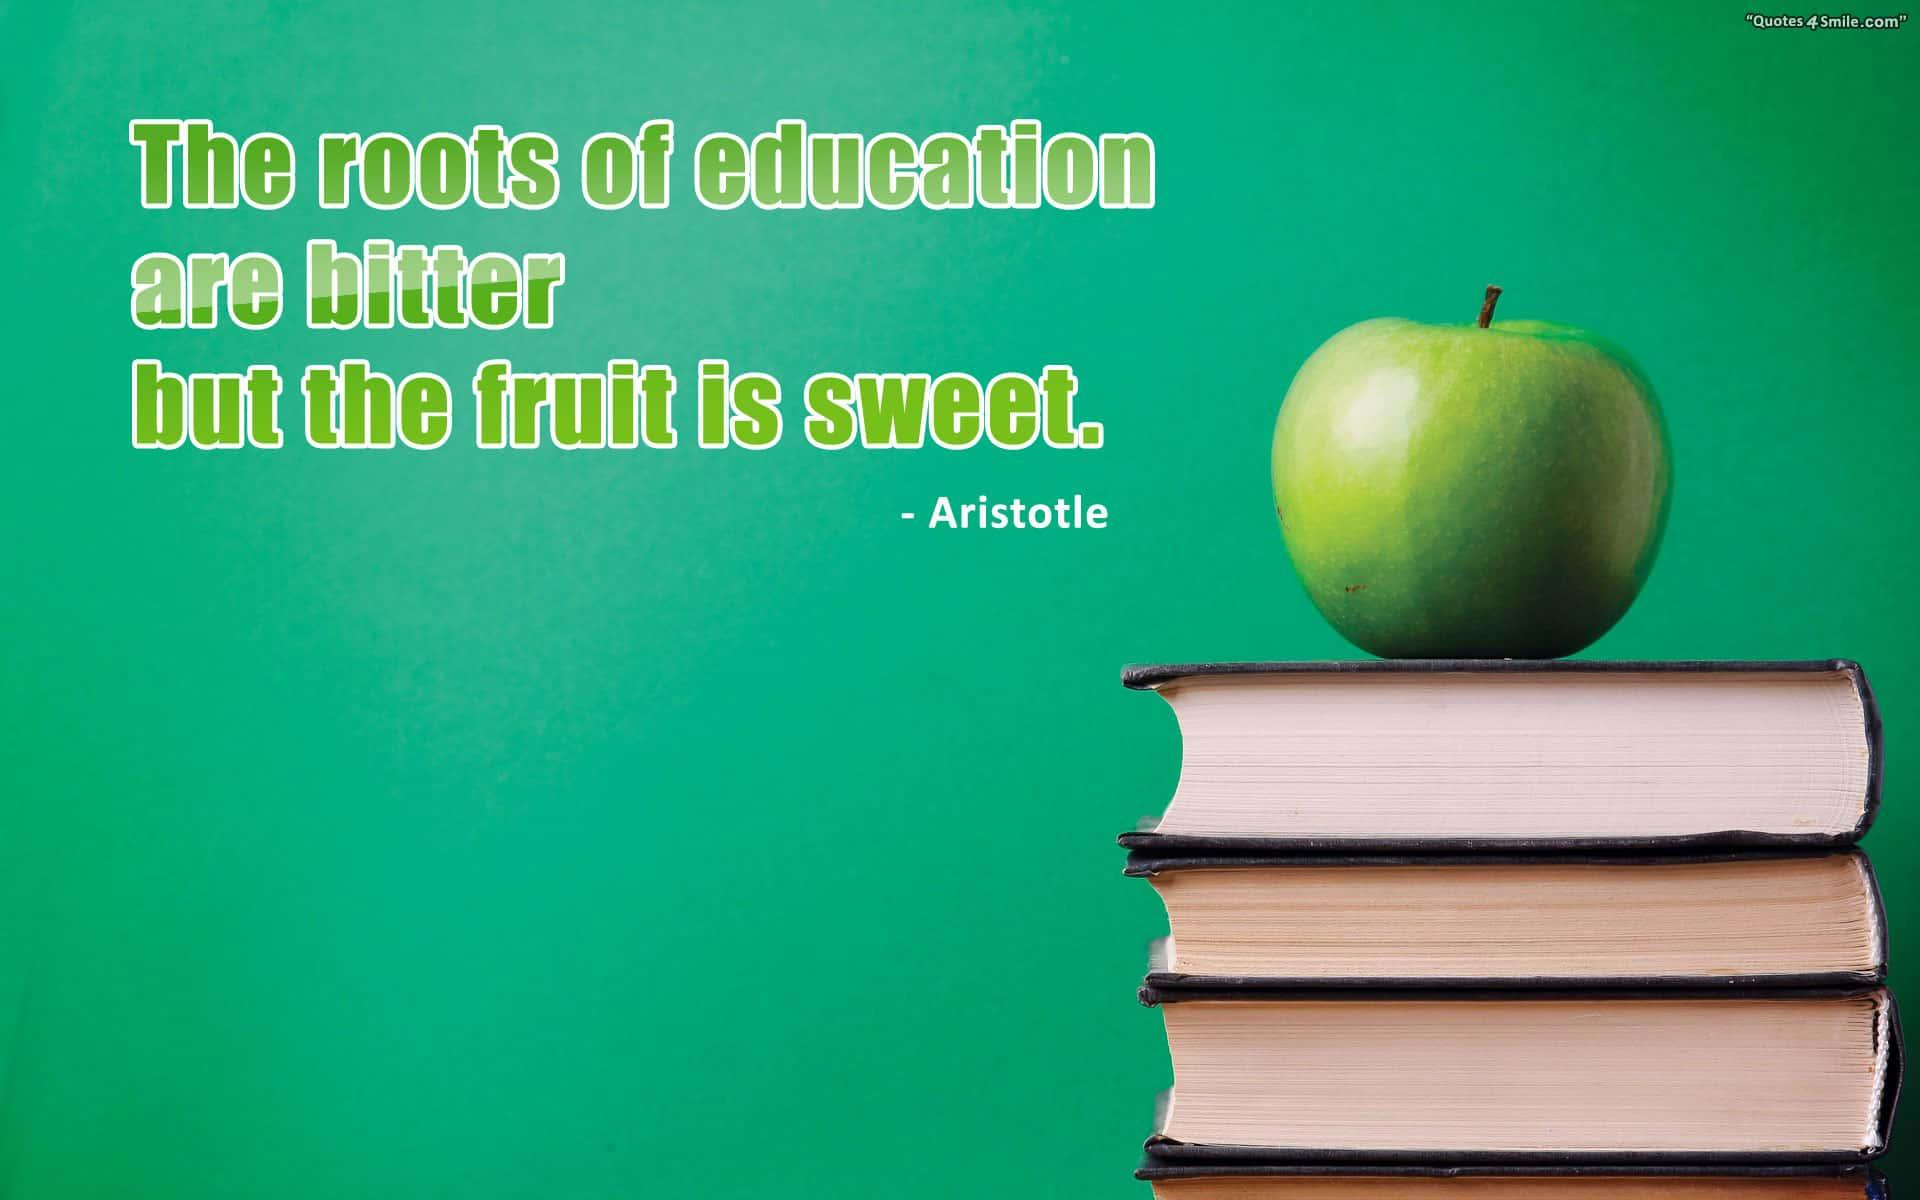 Contoh Iklan Pendidikan Yang Mudah Digambar